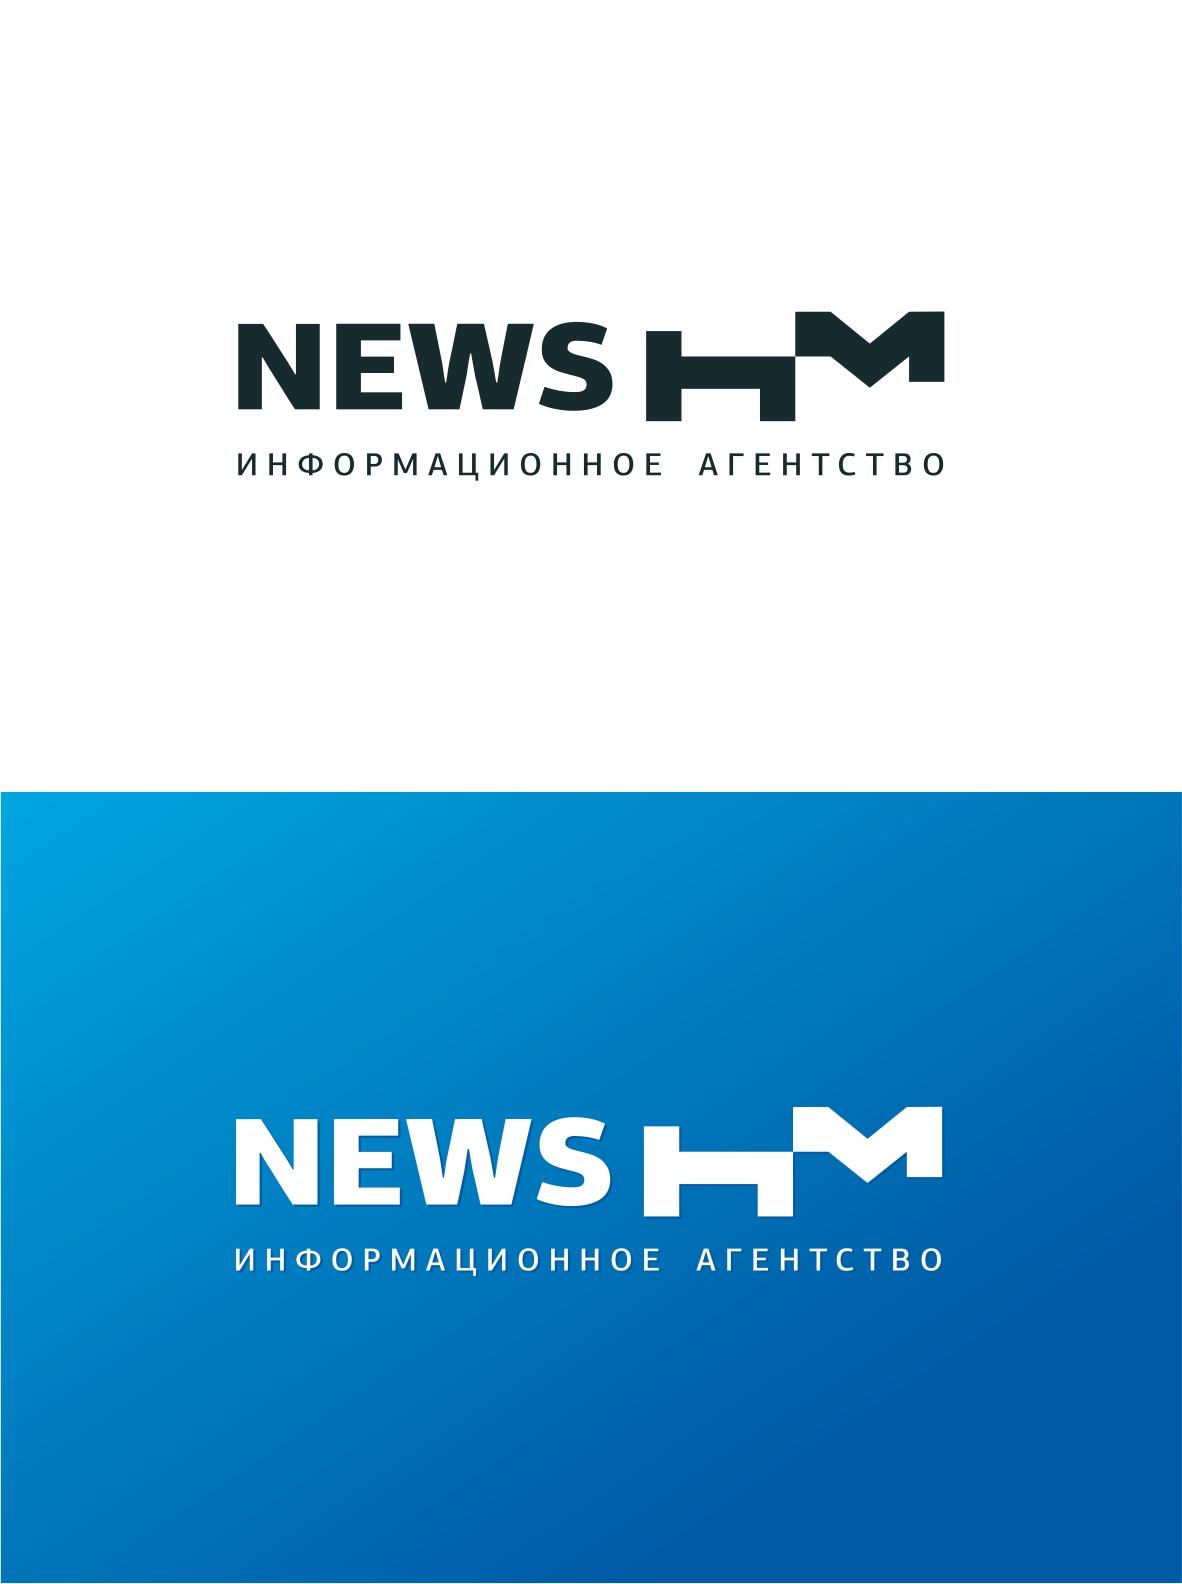 Логотип для информационного агентства фото f_8275aa3c1fa09677.jpg